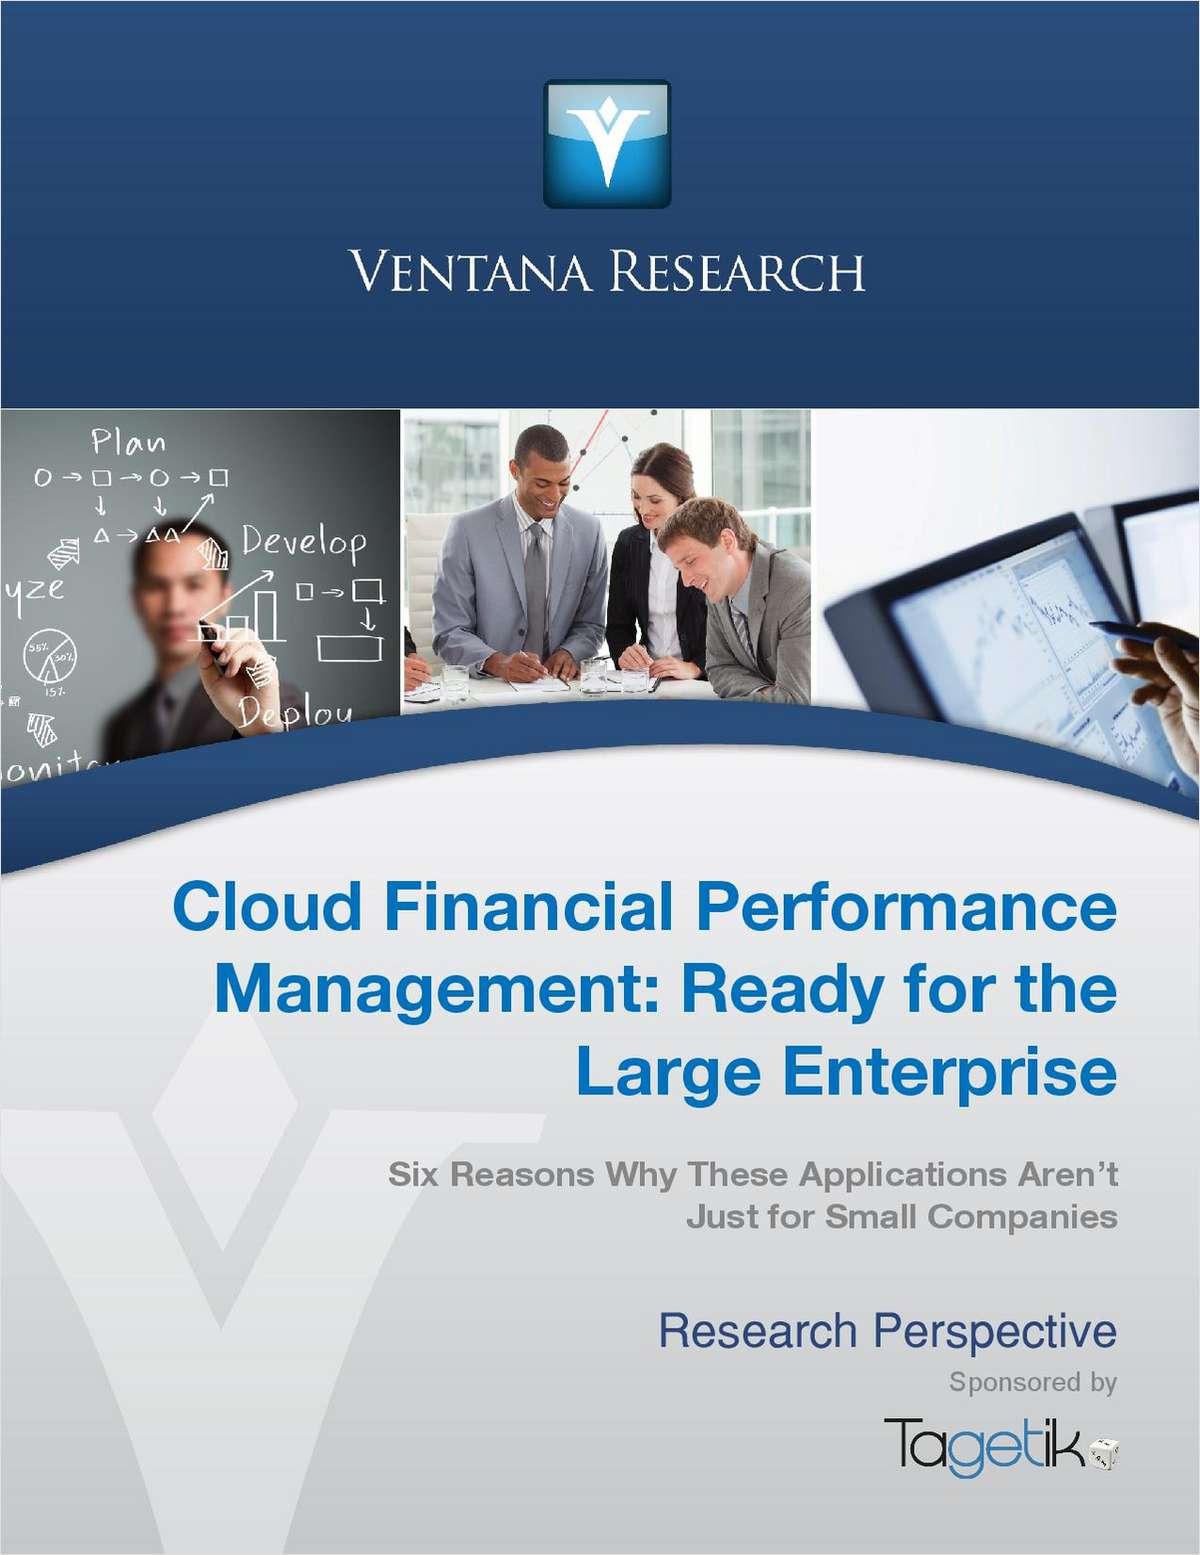 Ventana Research: Cloud Financial Management